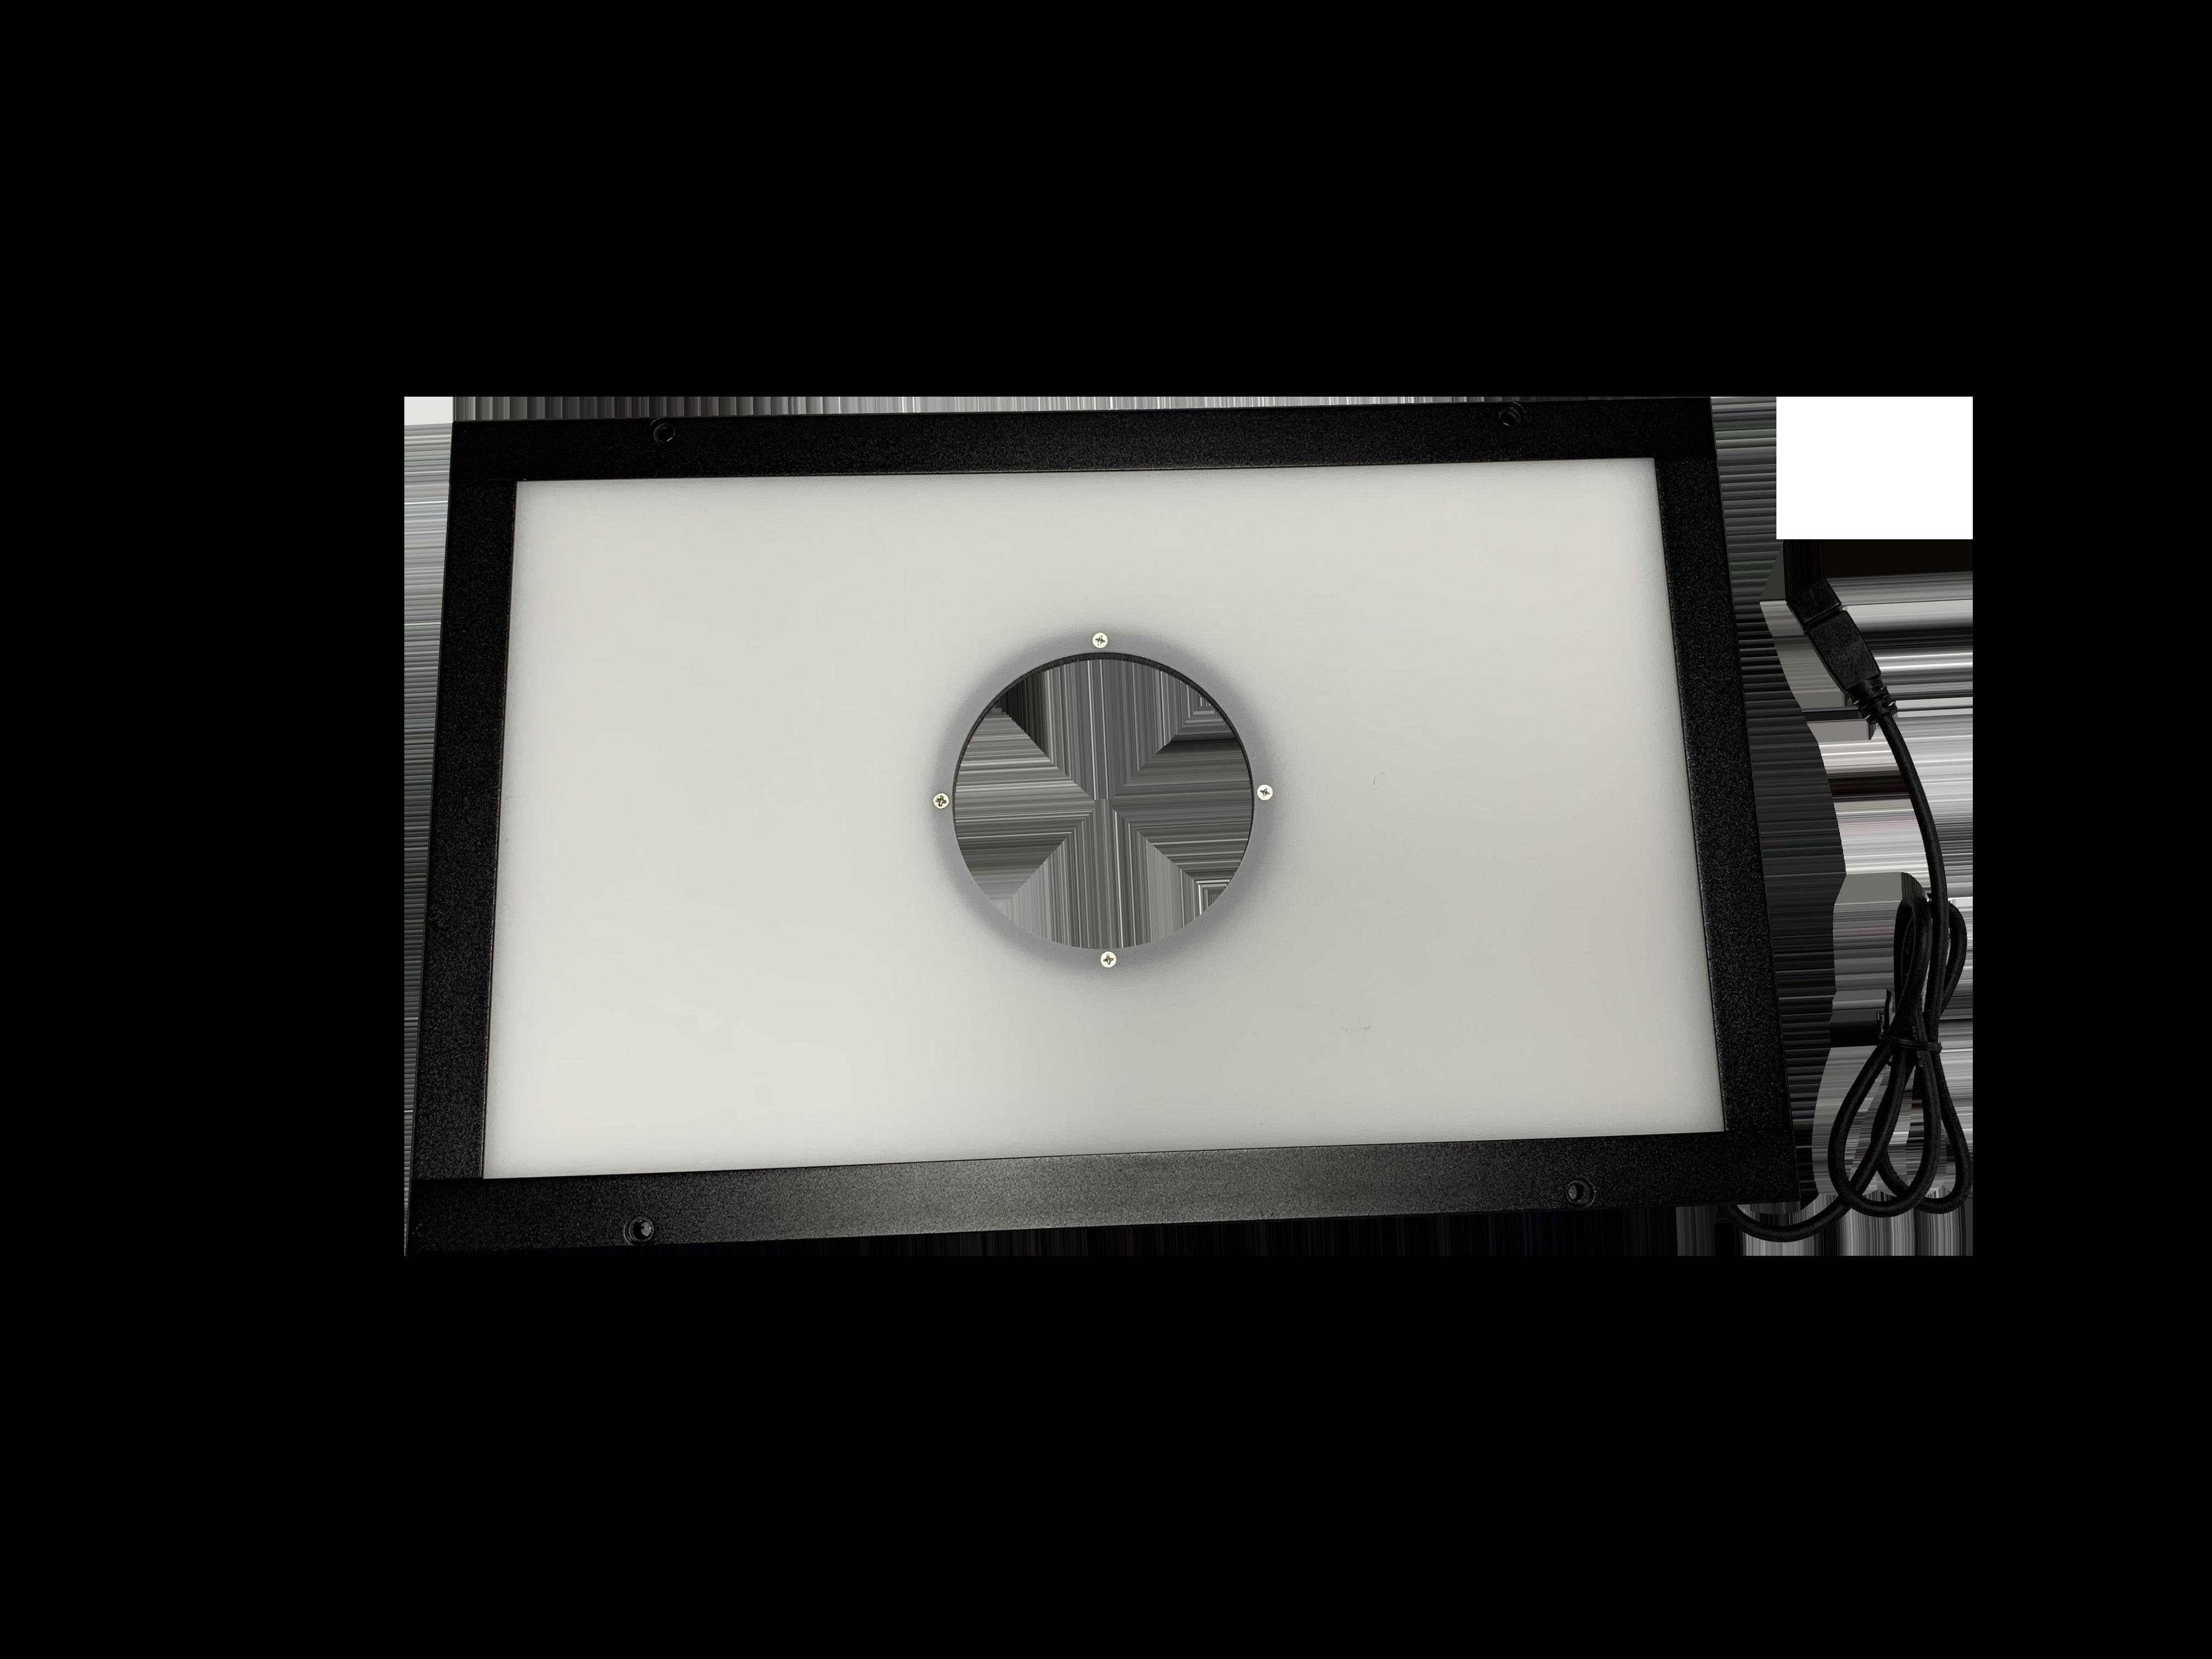 開孔側面導光光源FL270158K-K70